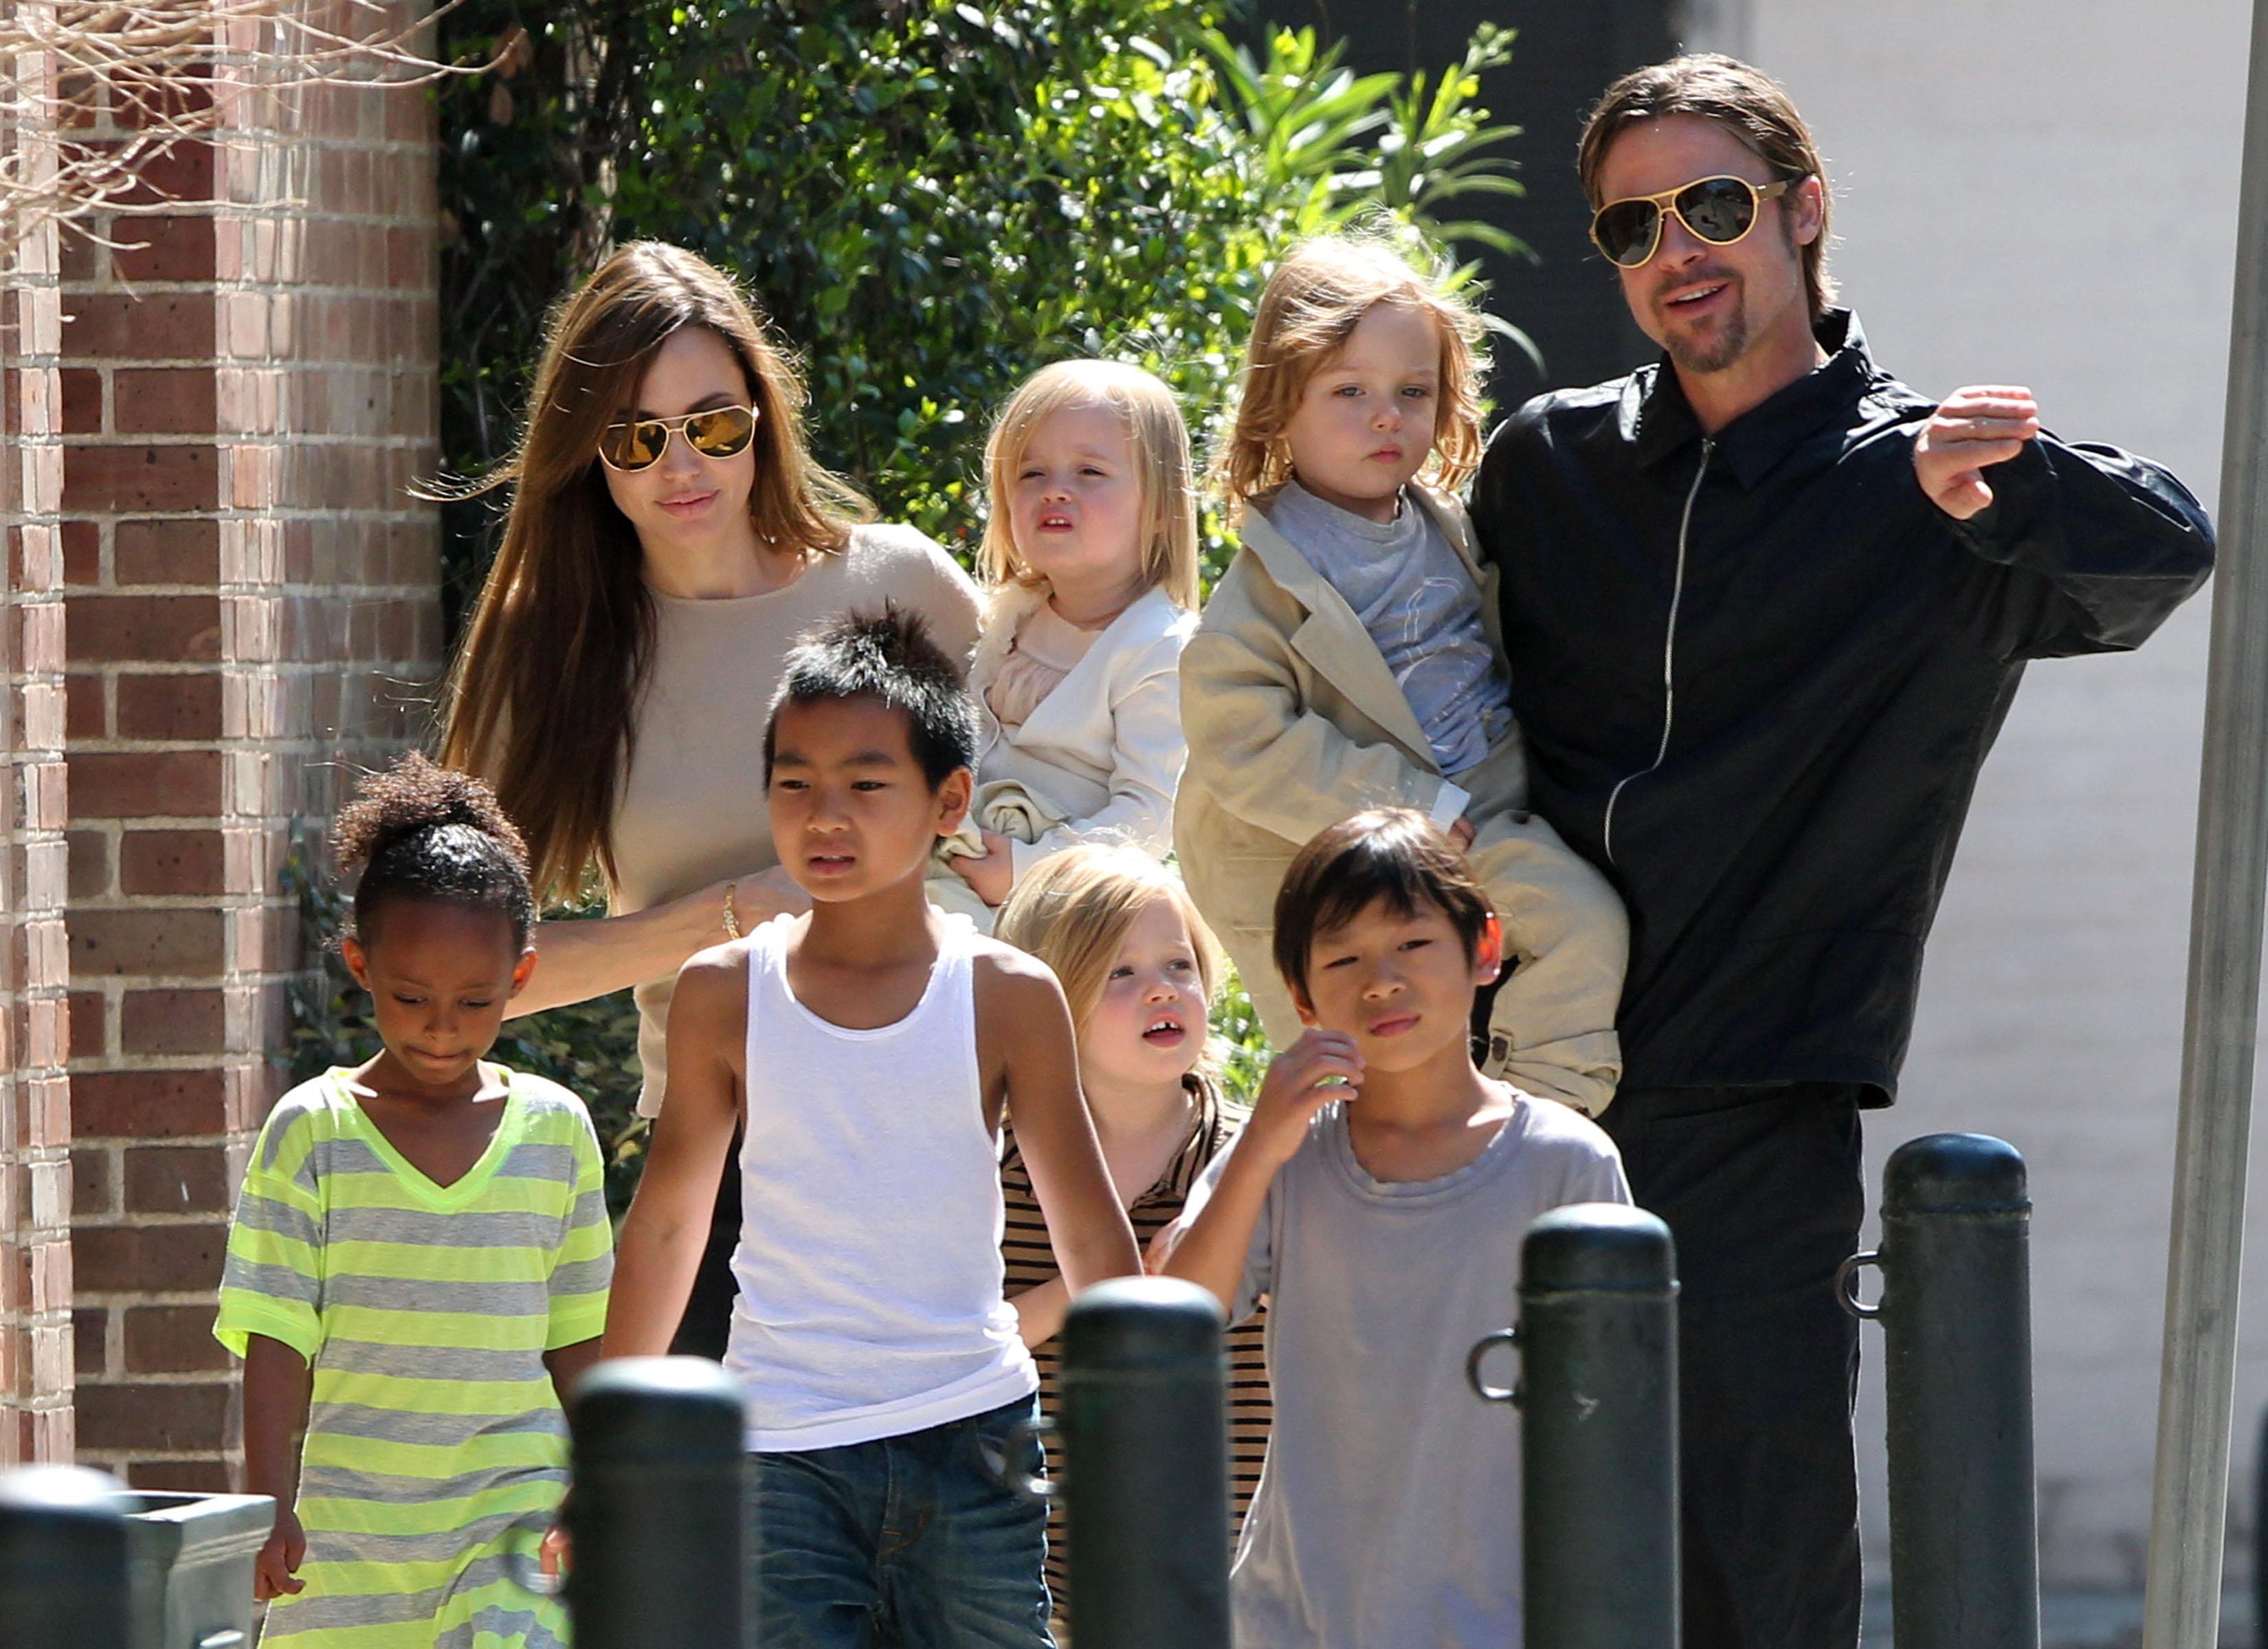 Анджелина Джоли и Брэд Питт: дети против развода!